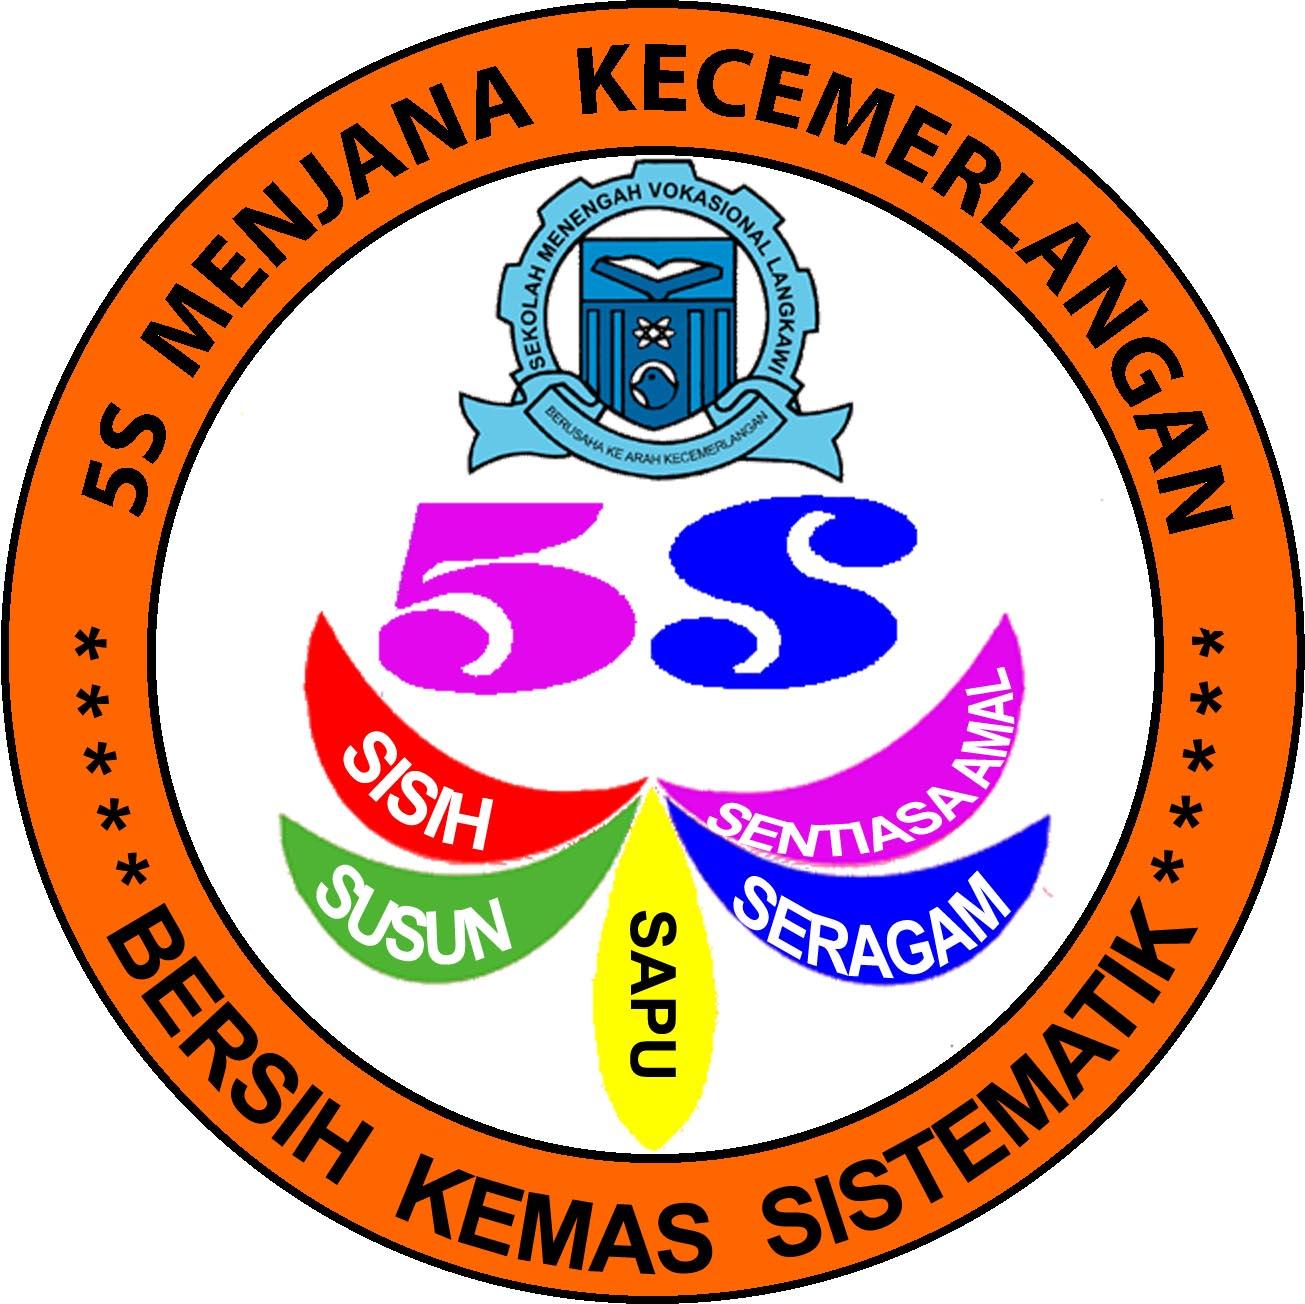 PROGRAM 5S: LOGO 5S SMV LANGKAWI